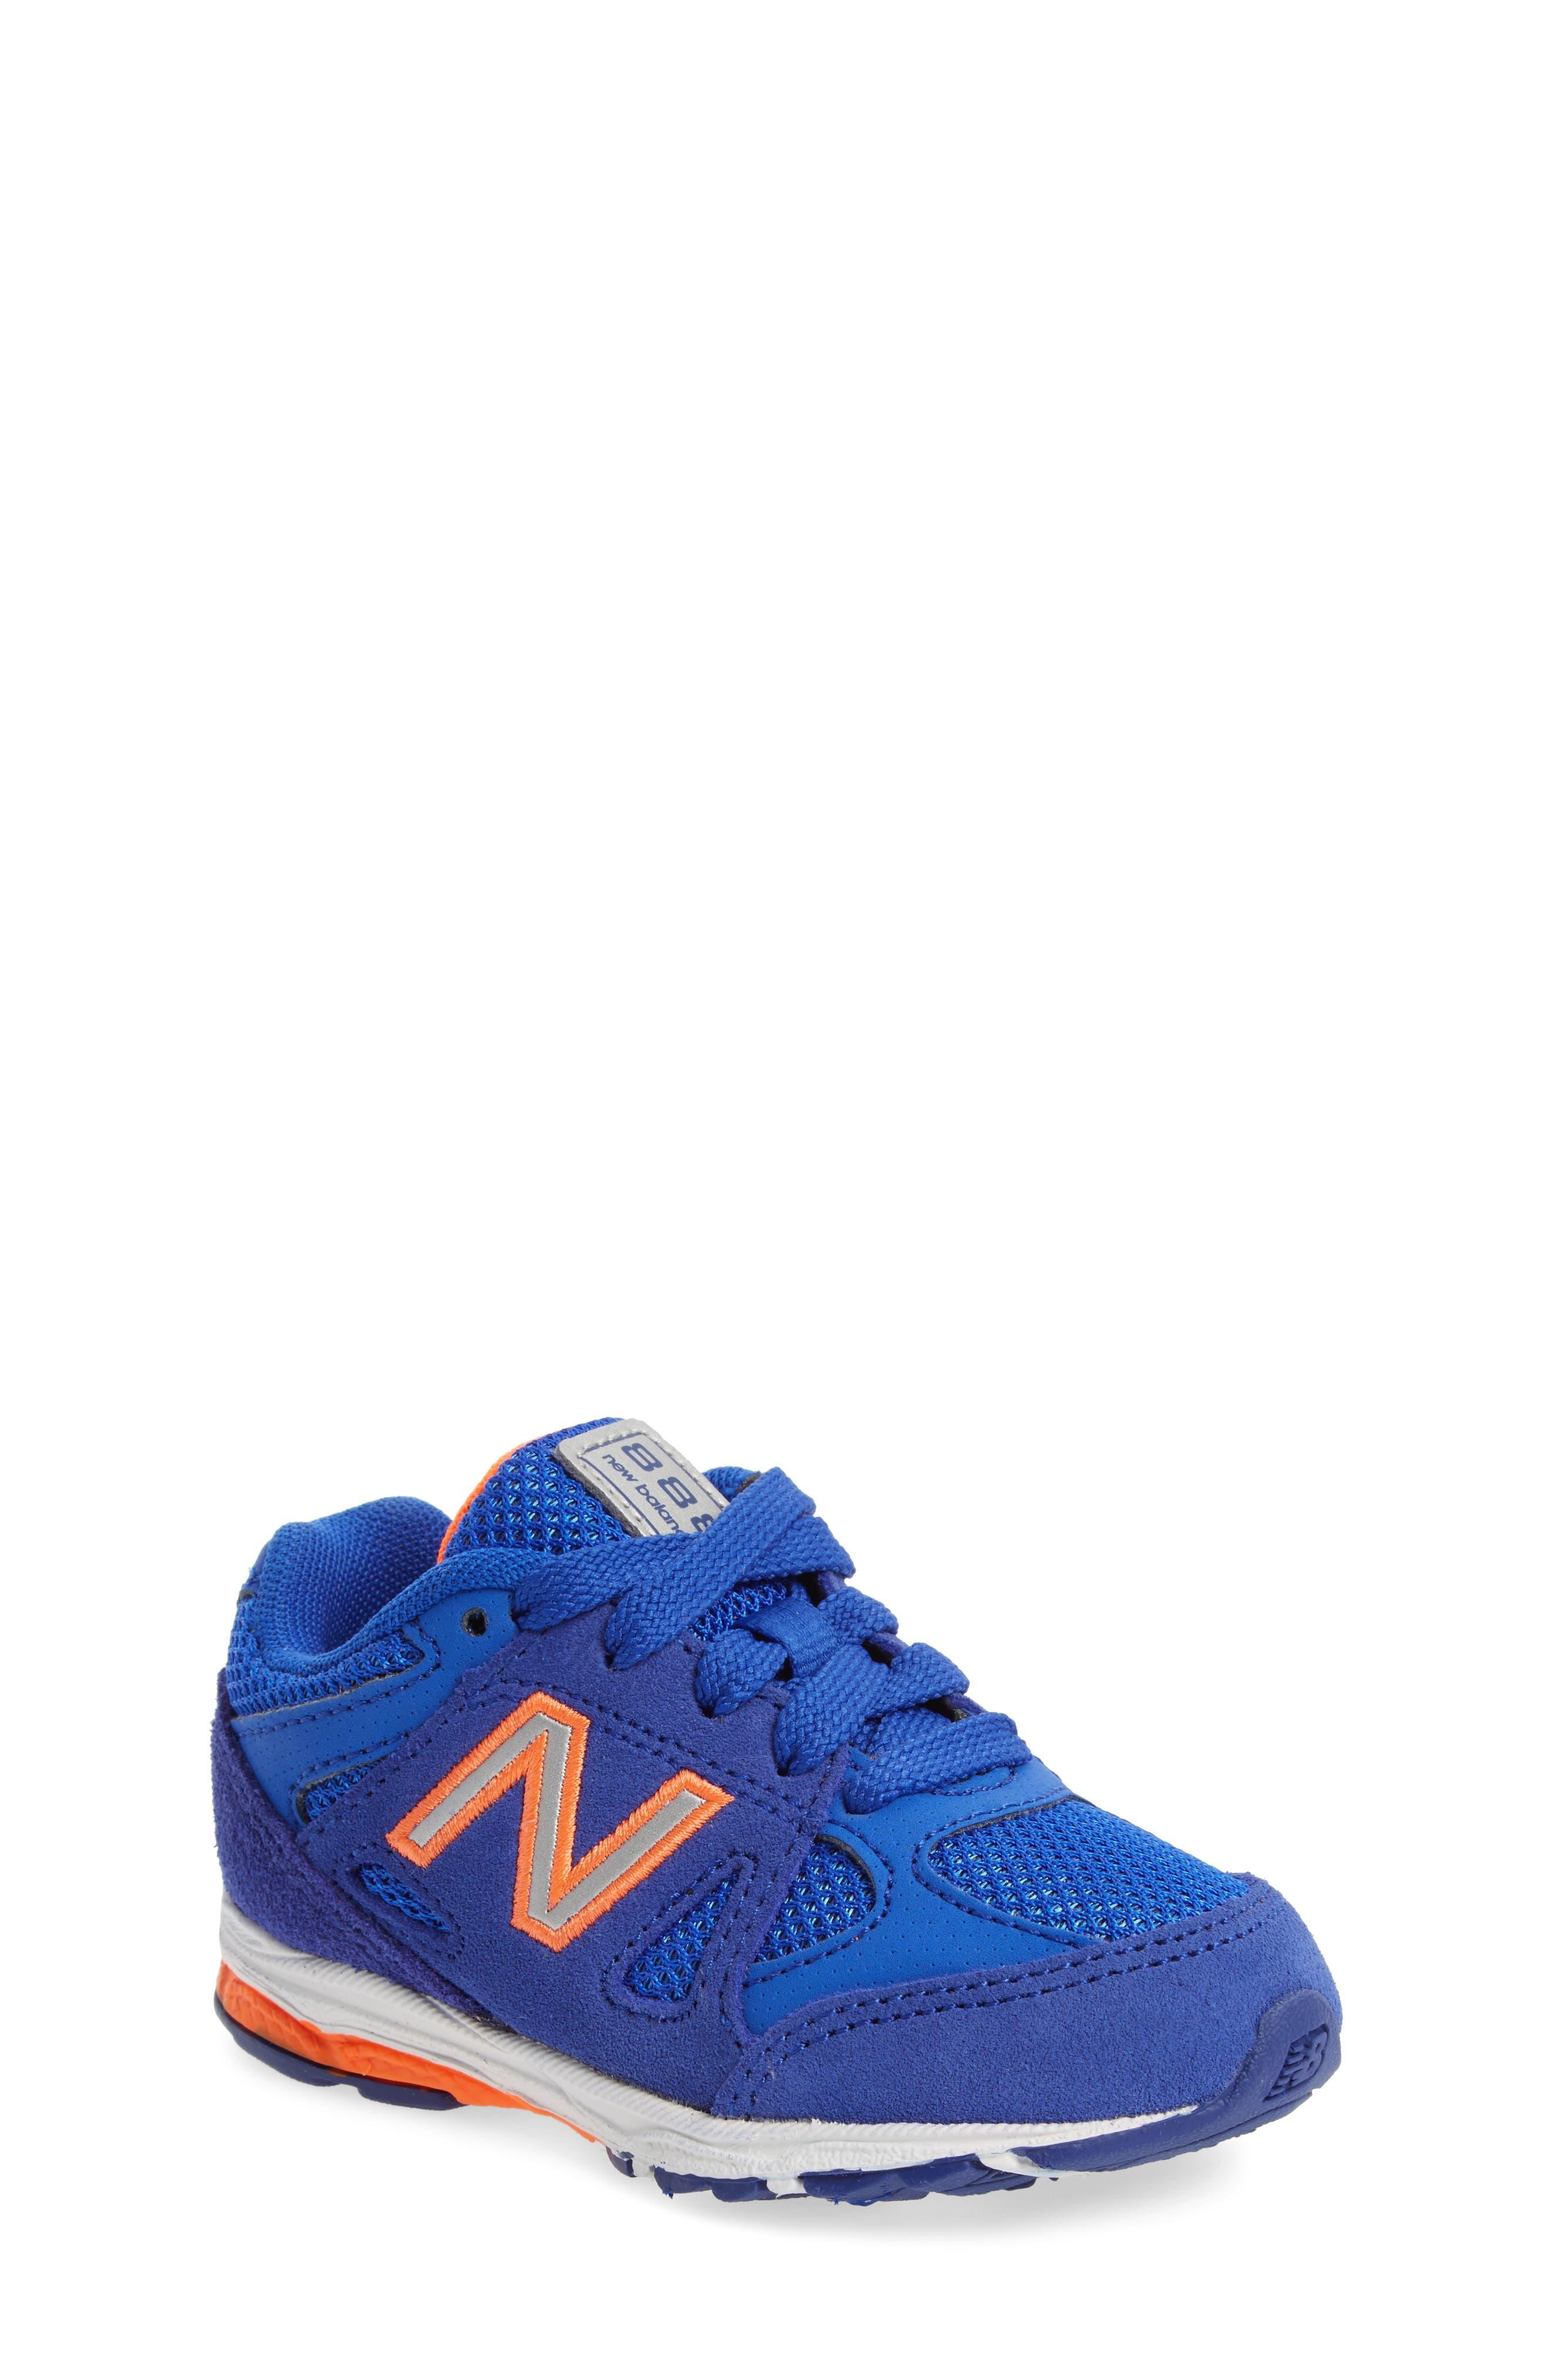 New Balance 888 Sneaker (Baby, Walker & Toddler)